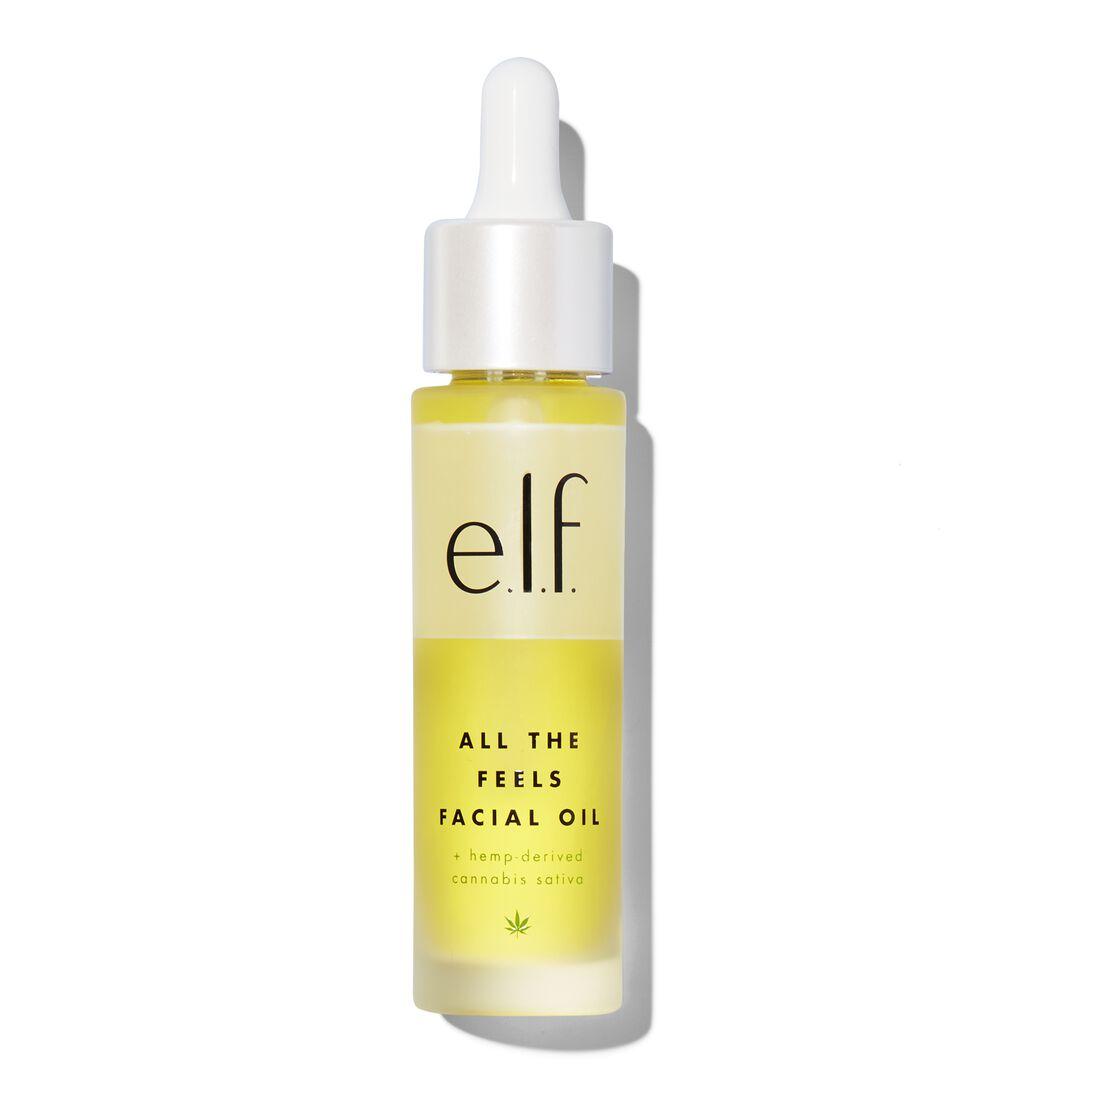 e.l.f. Cosmetics - All the Feels Facial Oil